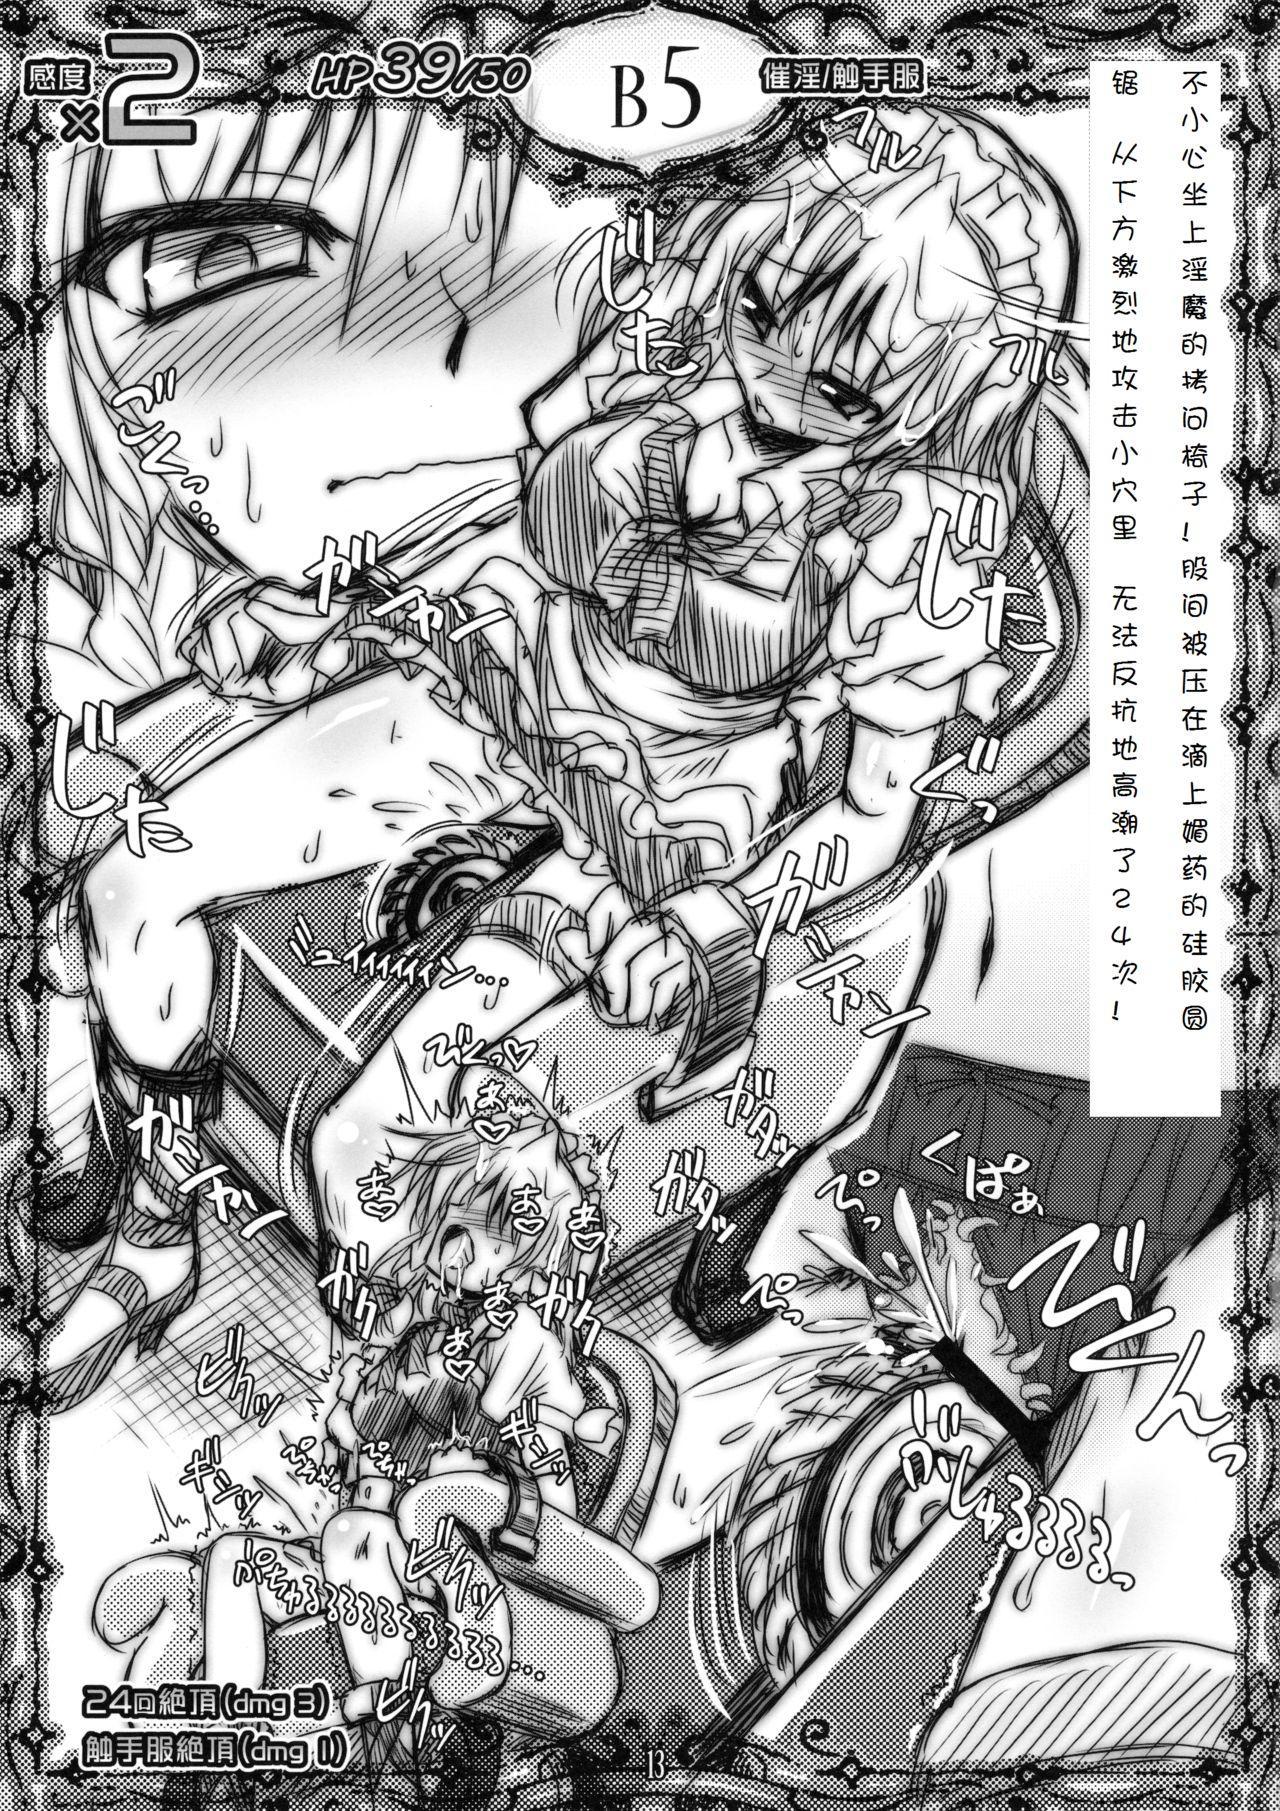 Sakuya vs Ero Trap 6